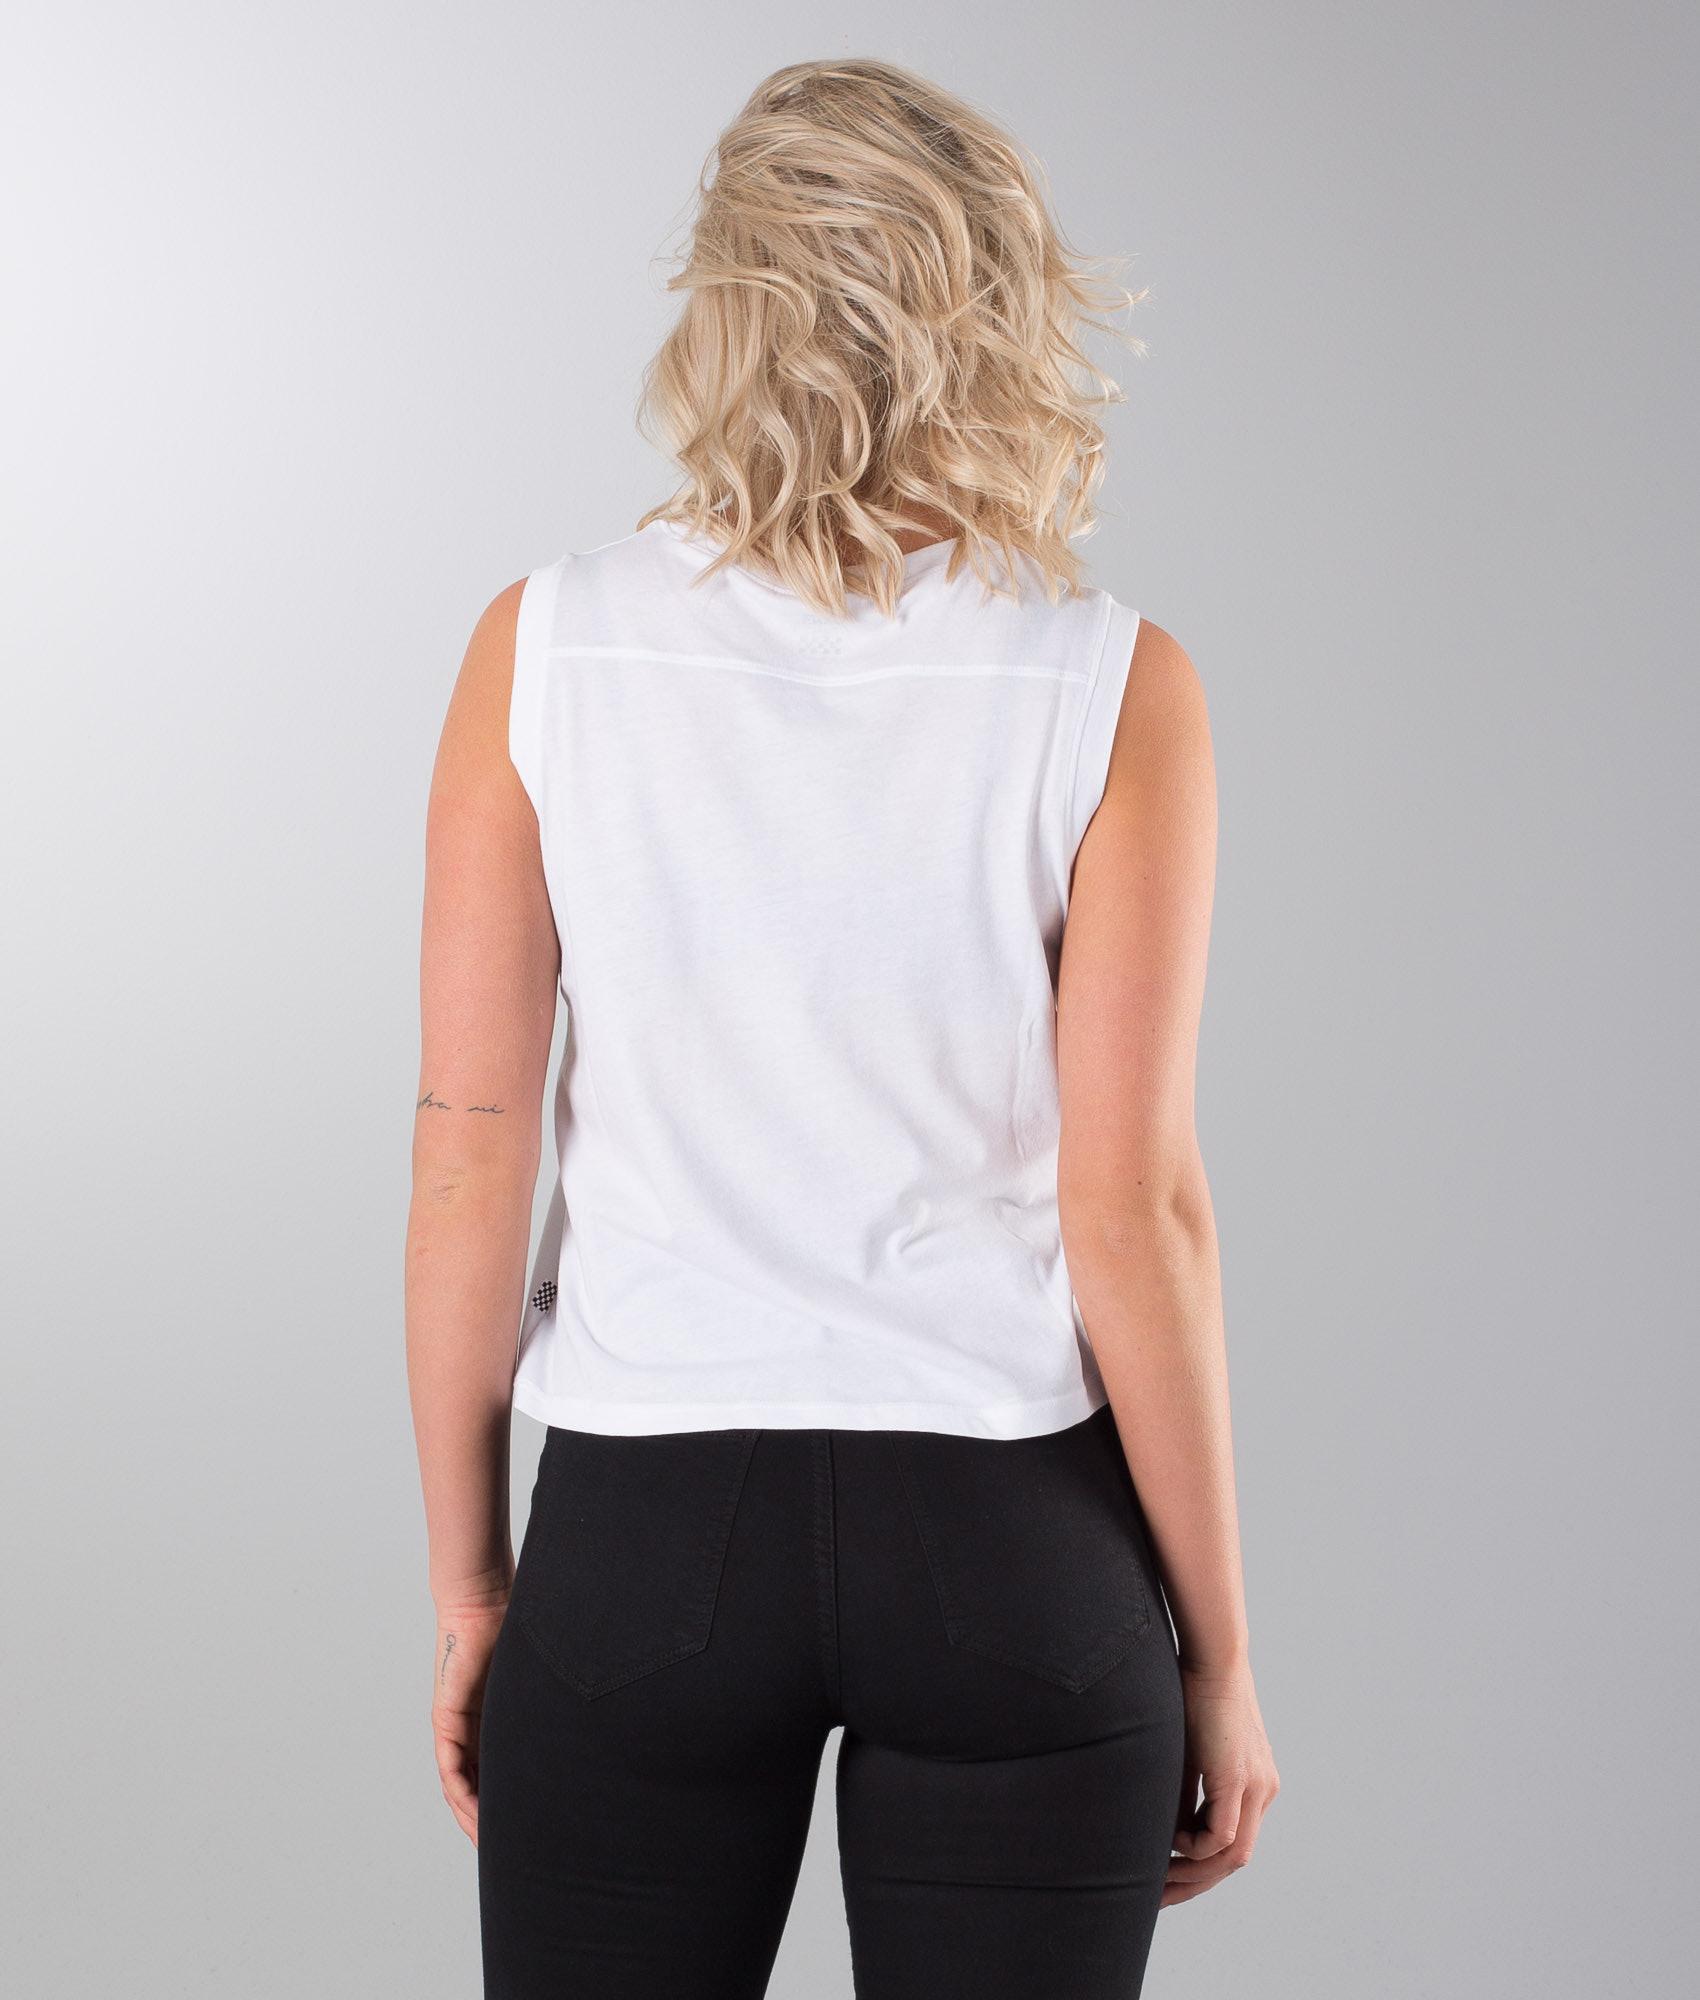 73493790fb7080 Vans Muscle V T-shirt White Black - Ridestore.com